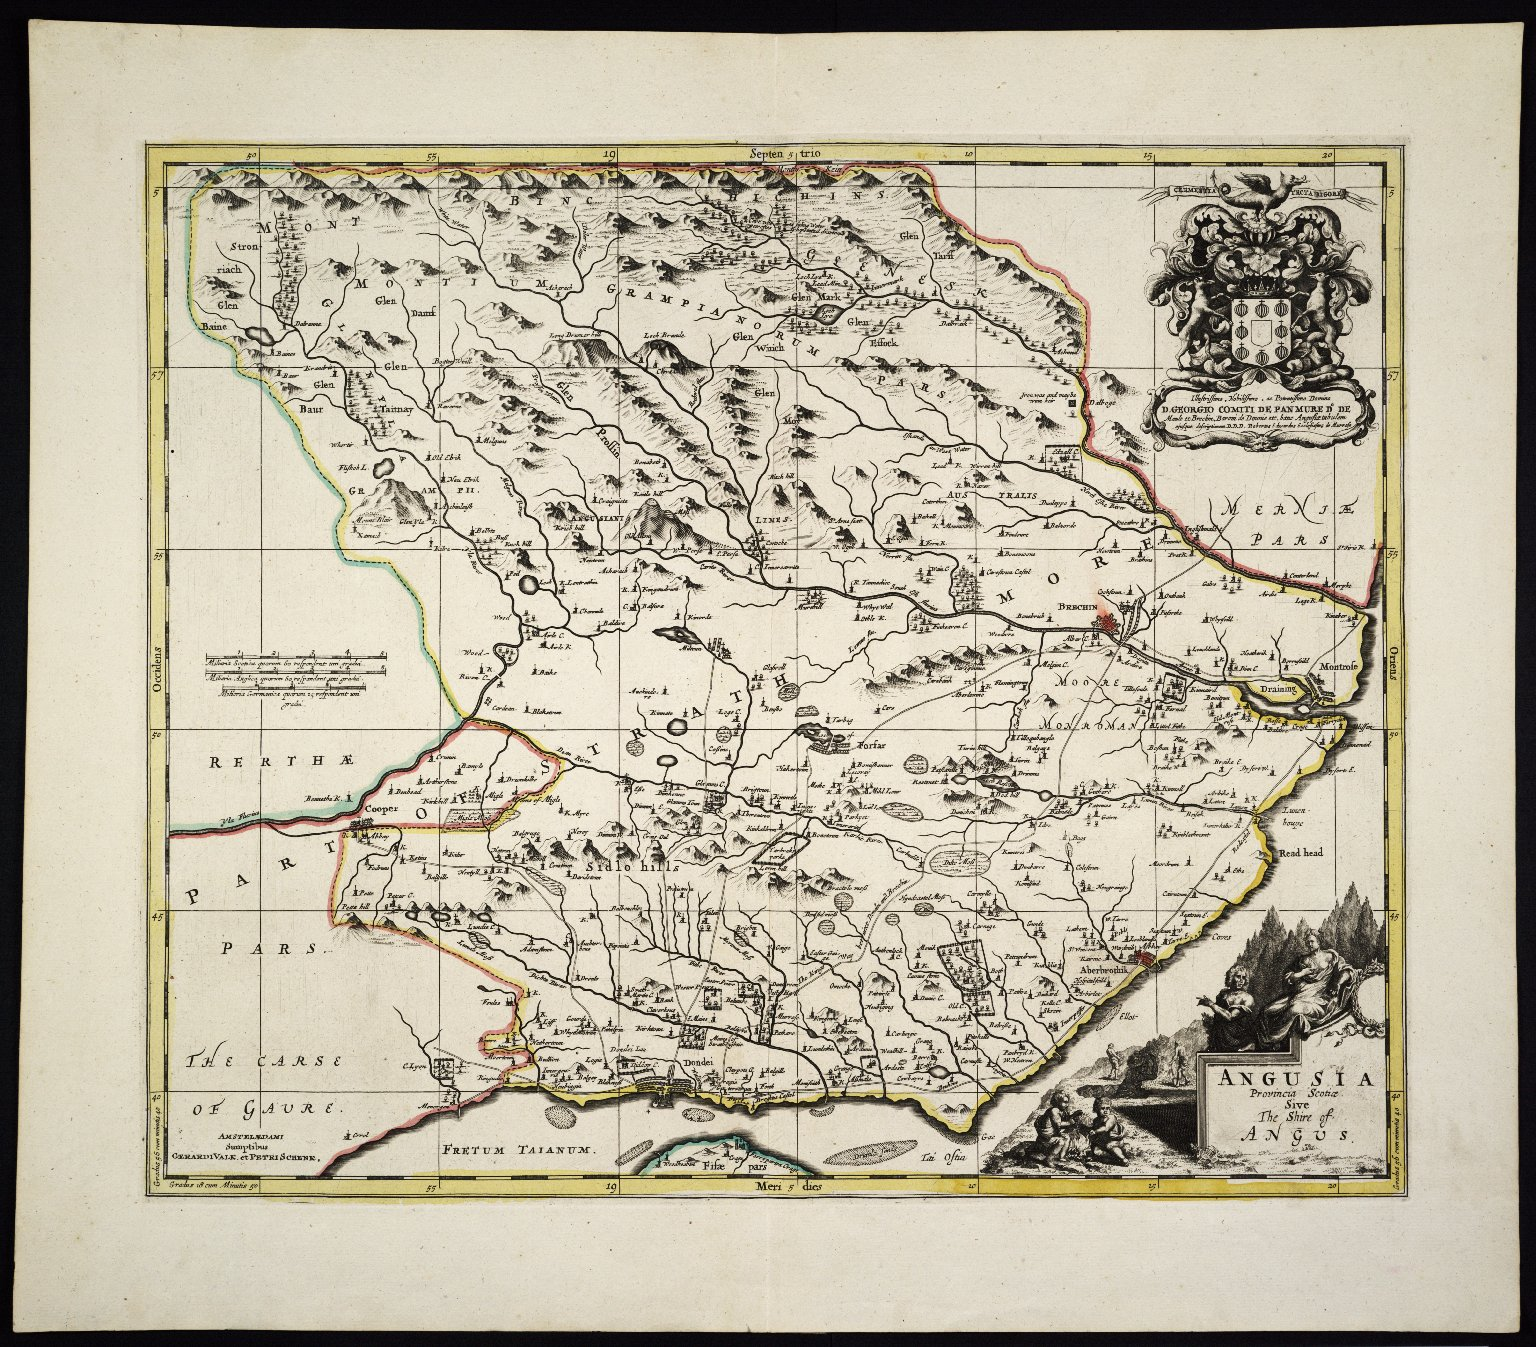 ANGUSIA Provincia Scotiae sive The Shire of ANGUS [1 of 1]